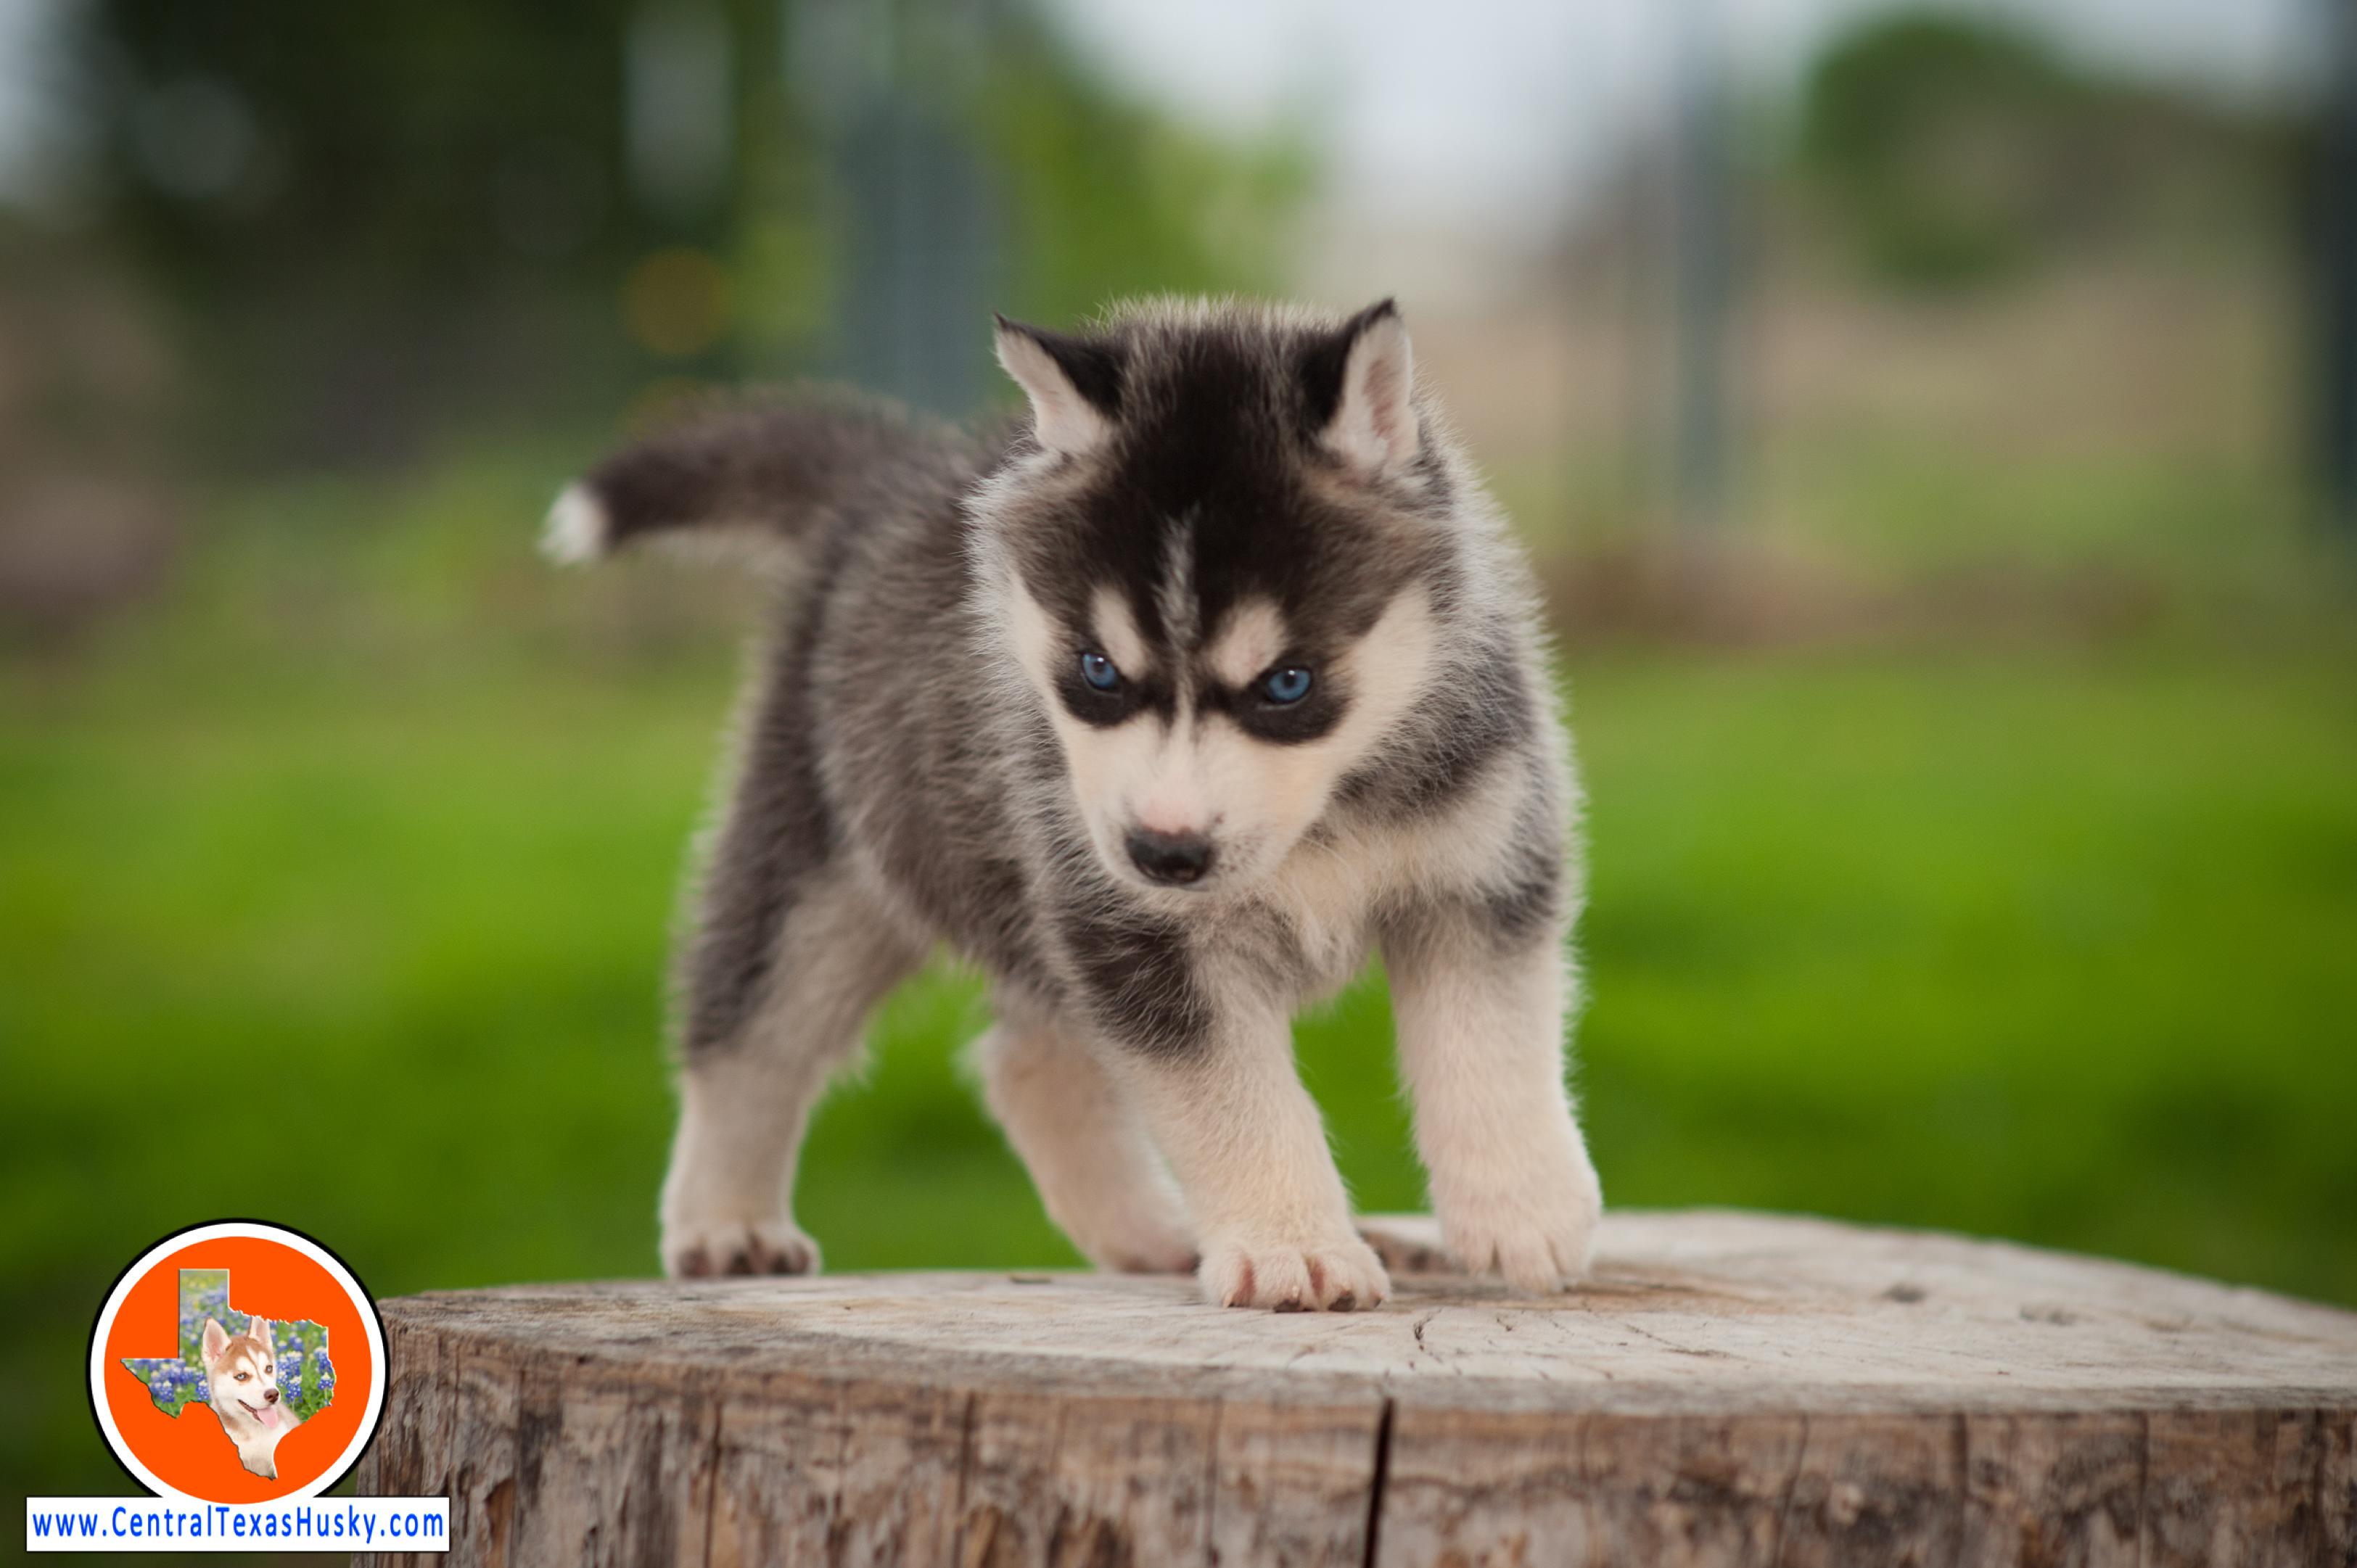 central-texas-husky_austin-siberian-husky-breeder_703962_20180324